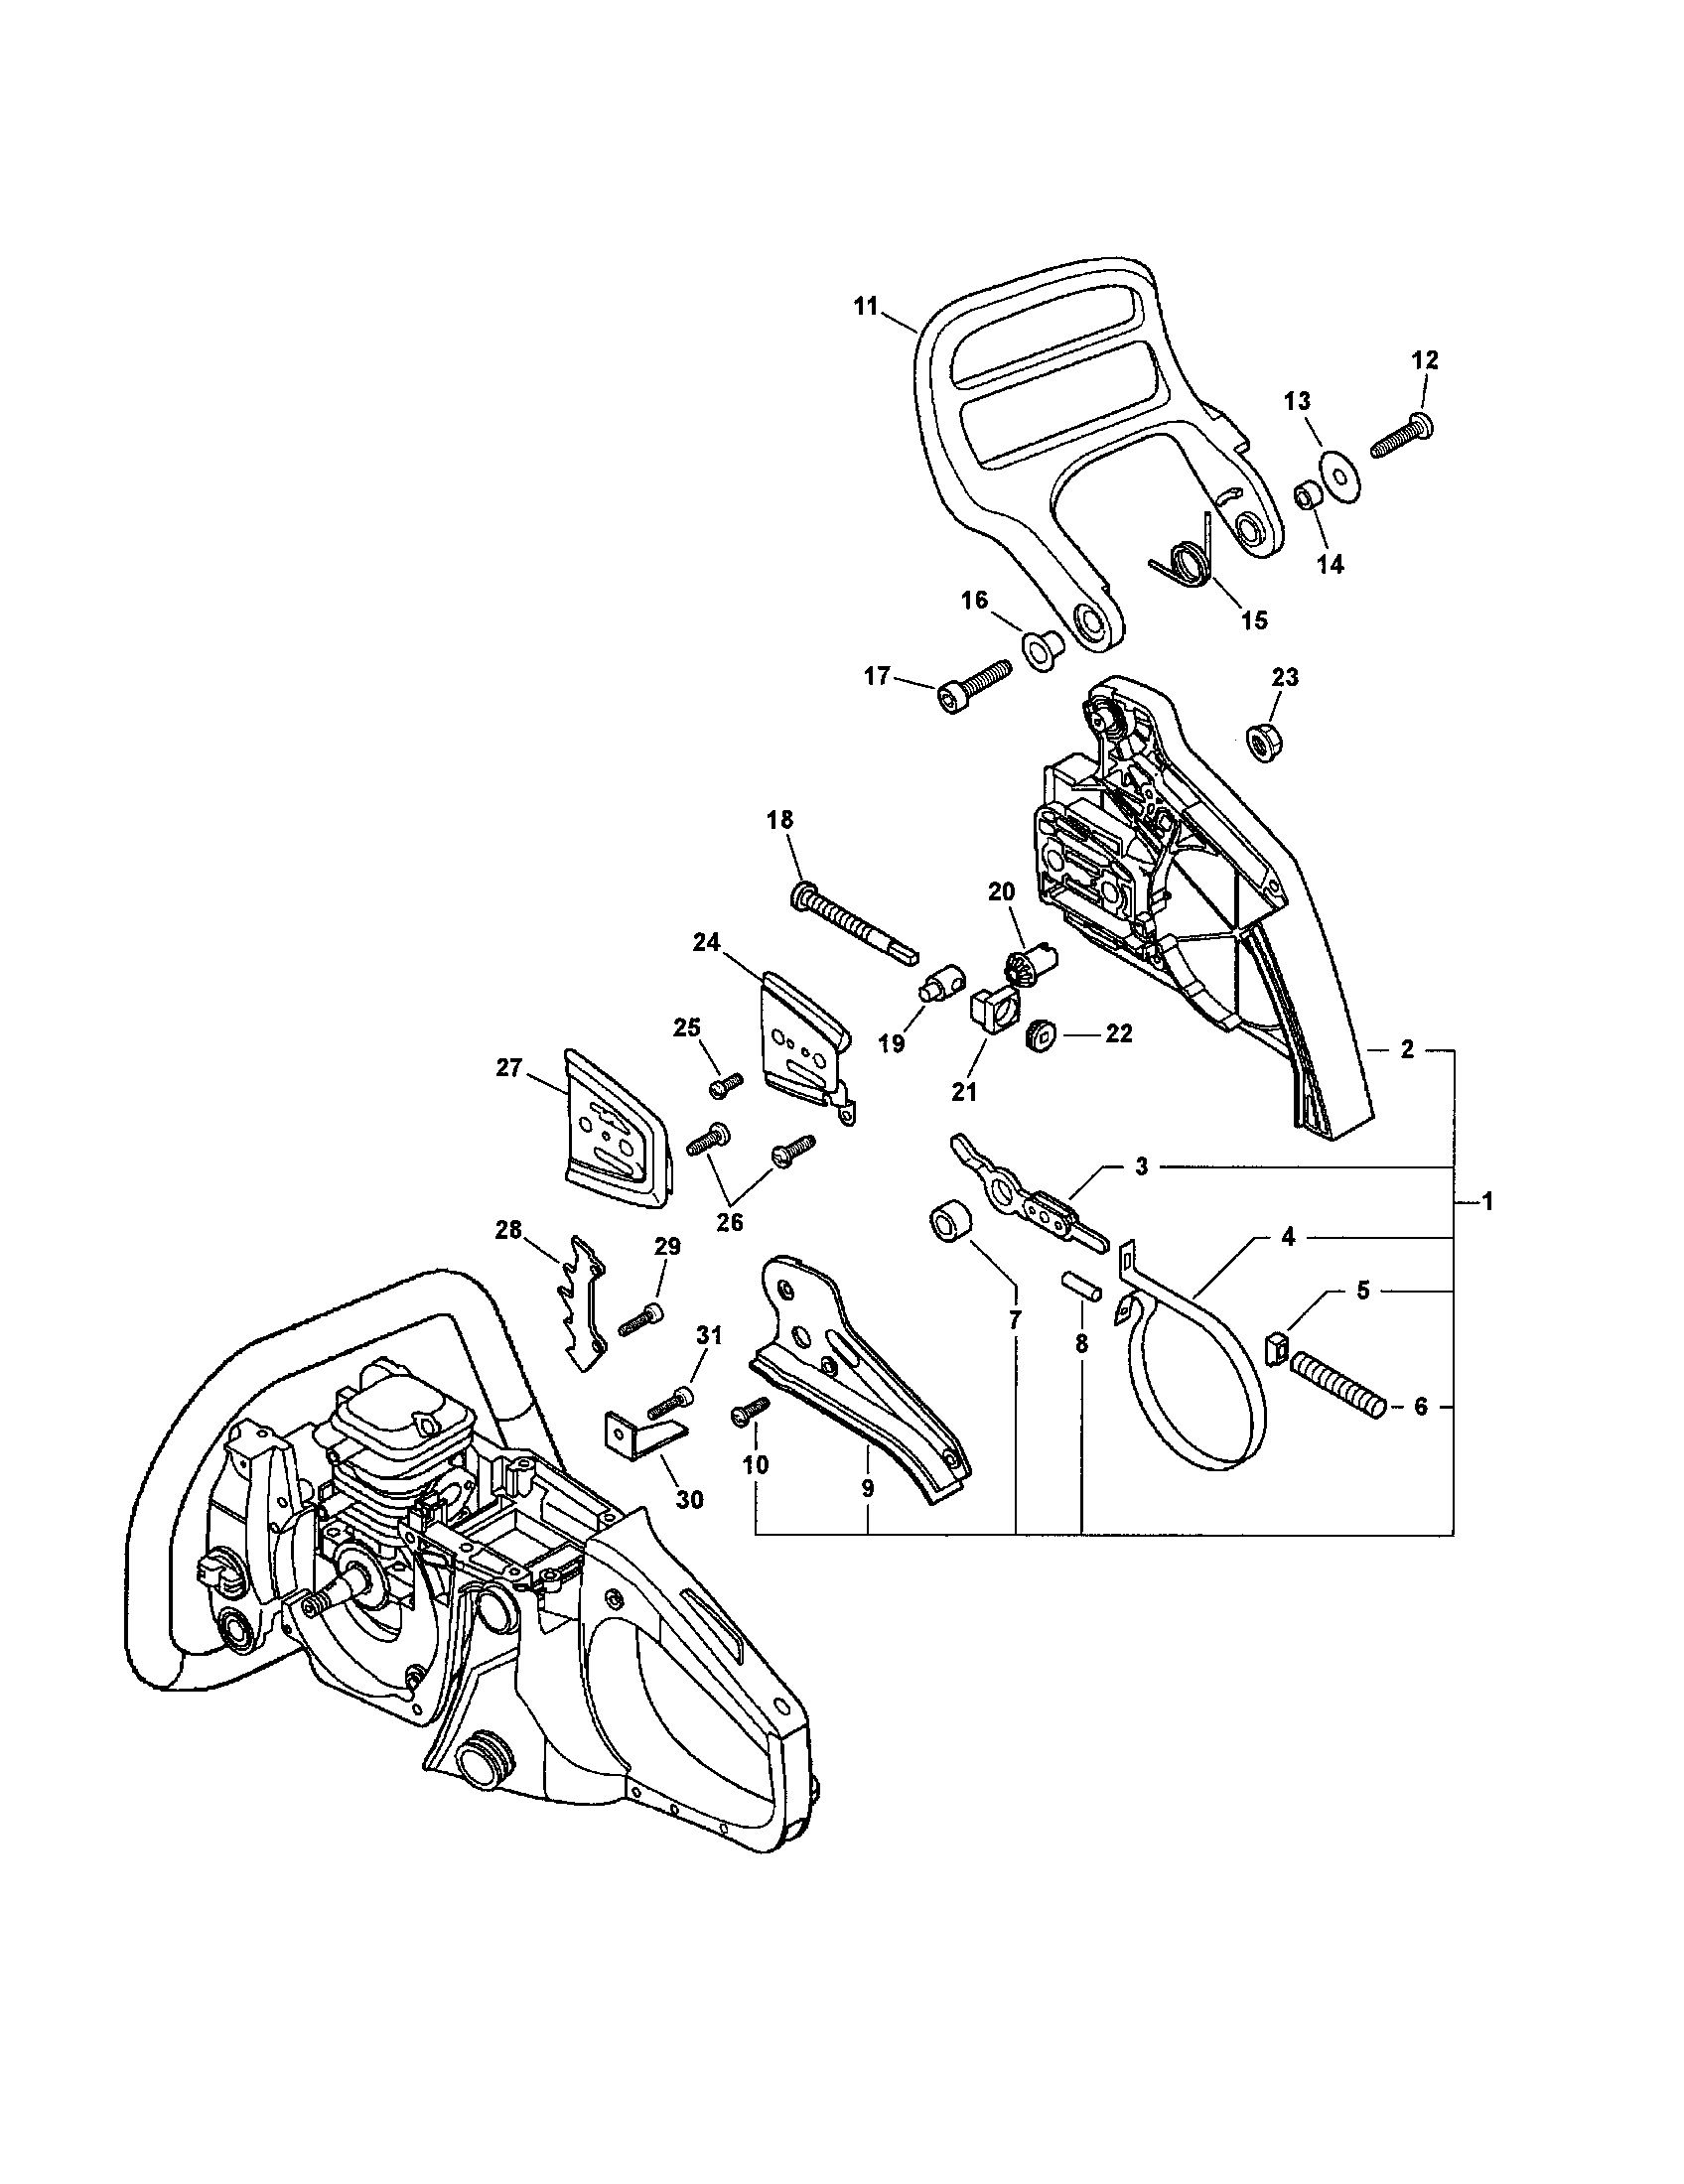 Echo Chainsaw Parts Diagram. Diagram. Auto Wiring Diagram